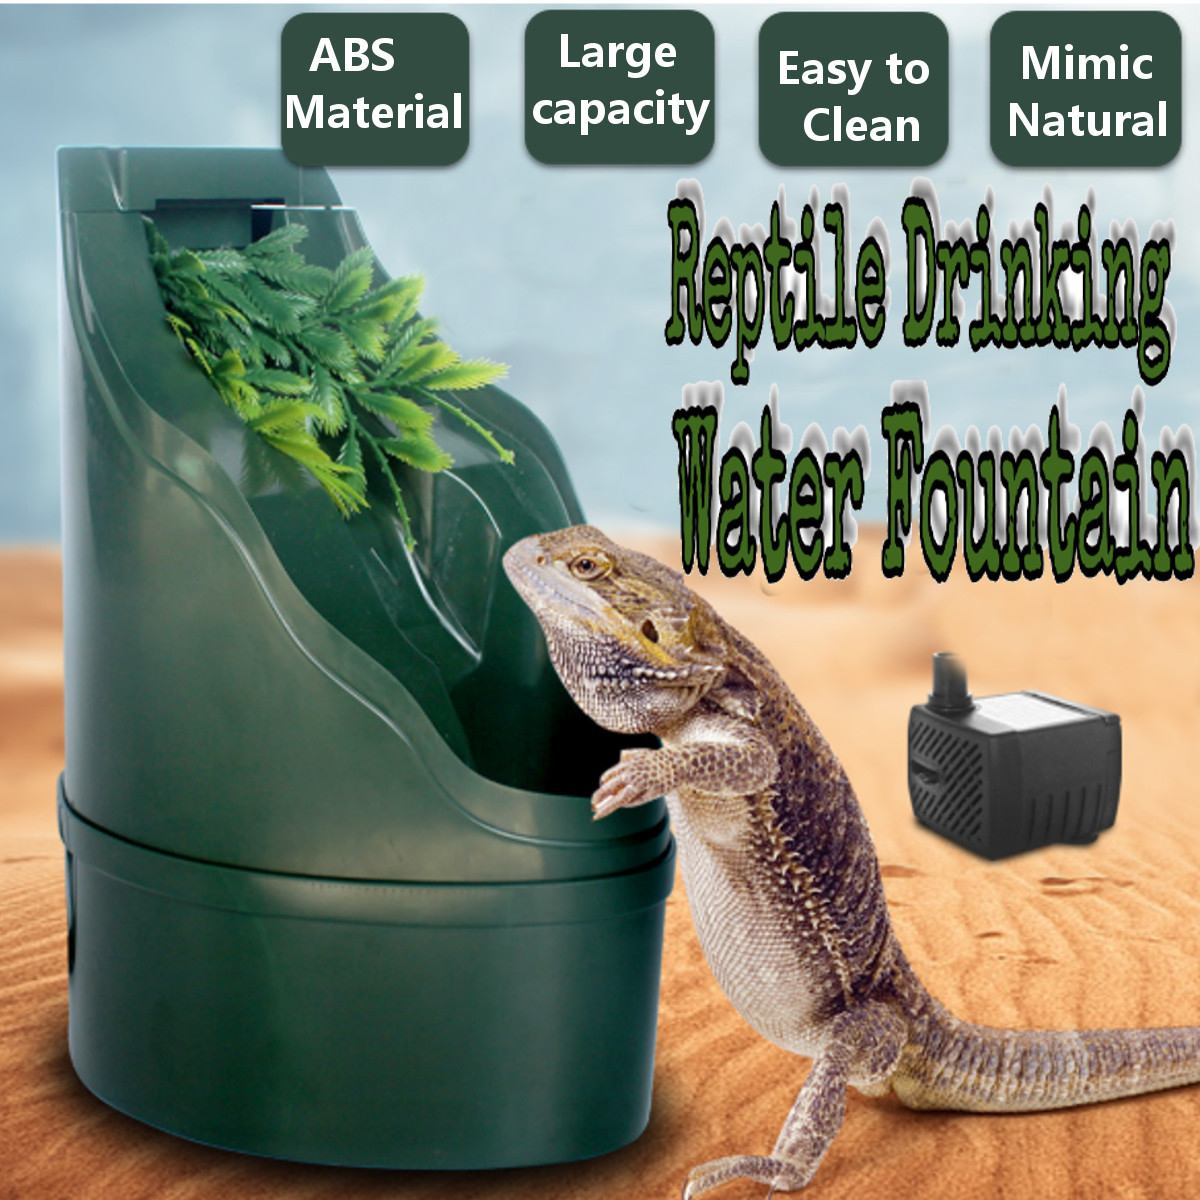 180x275cm Reptile Drinking Water Feeder Filter Fountain Feeding Chameleon Lizard Dispenser Terrarium Reptiles Feeding Supplies